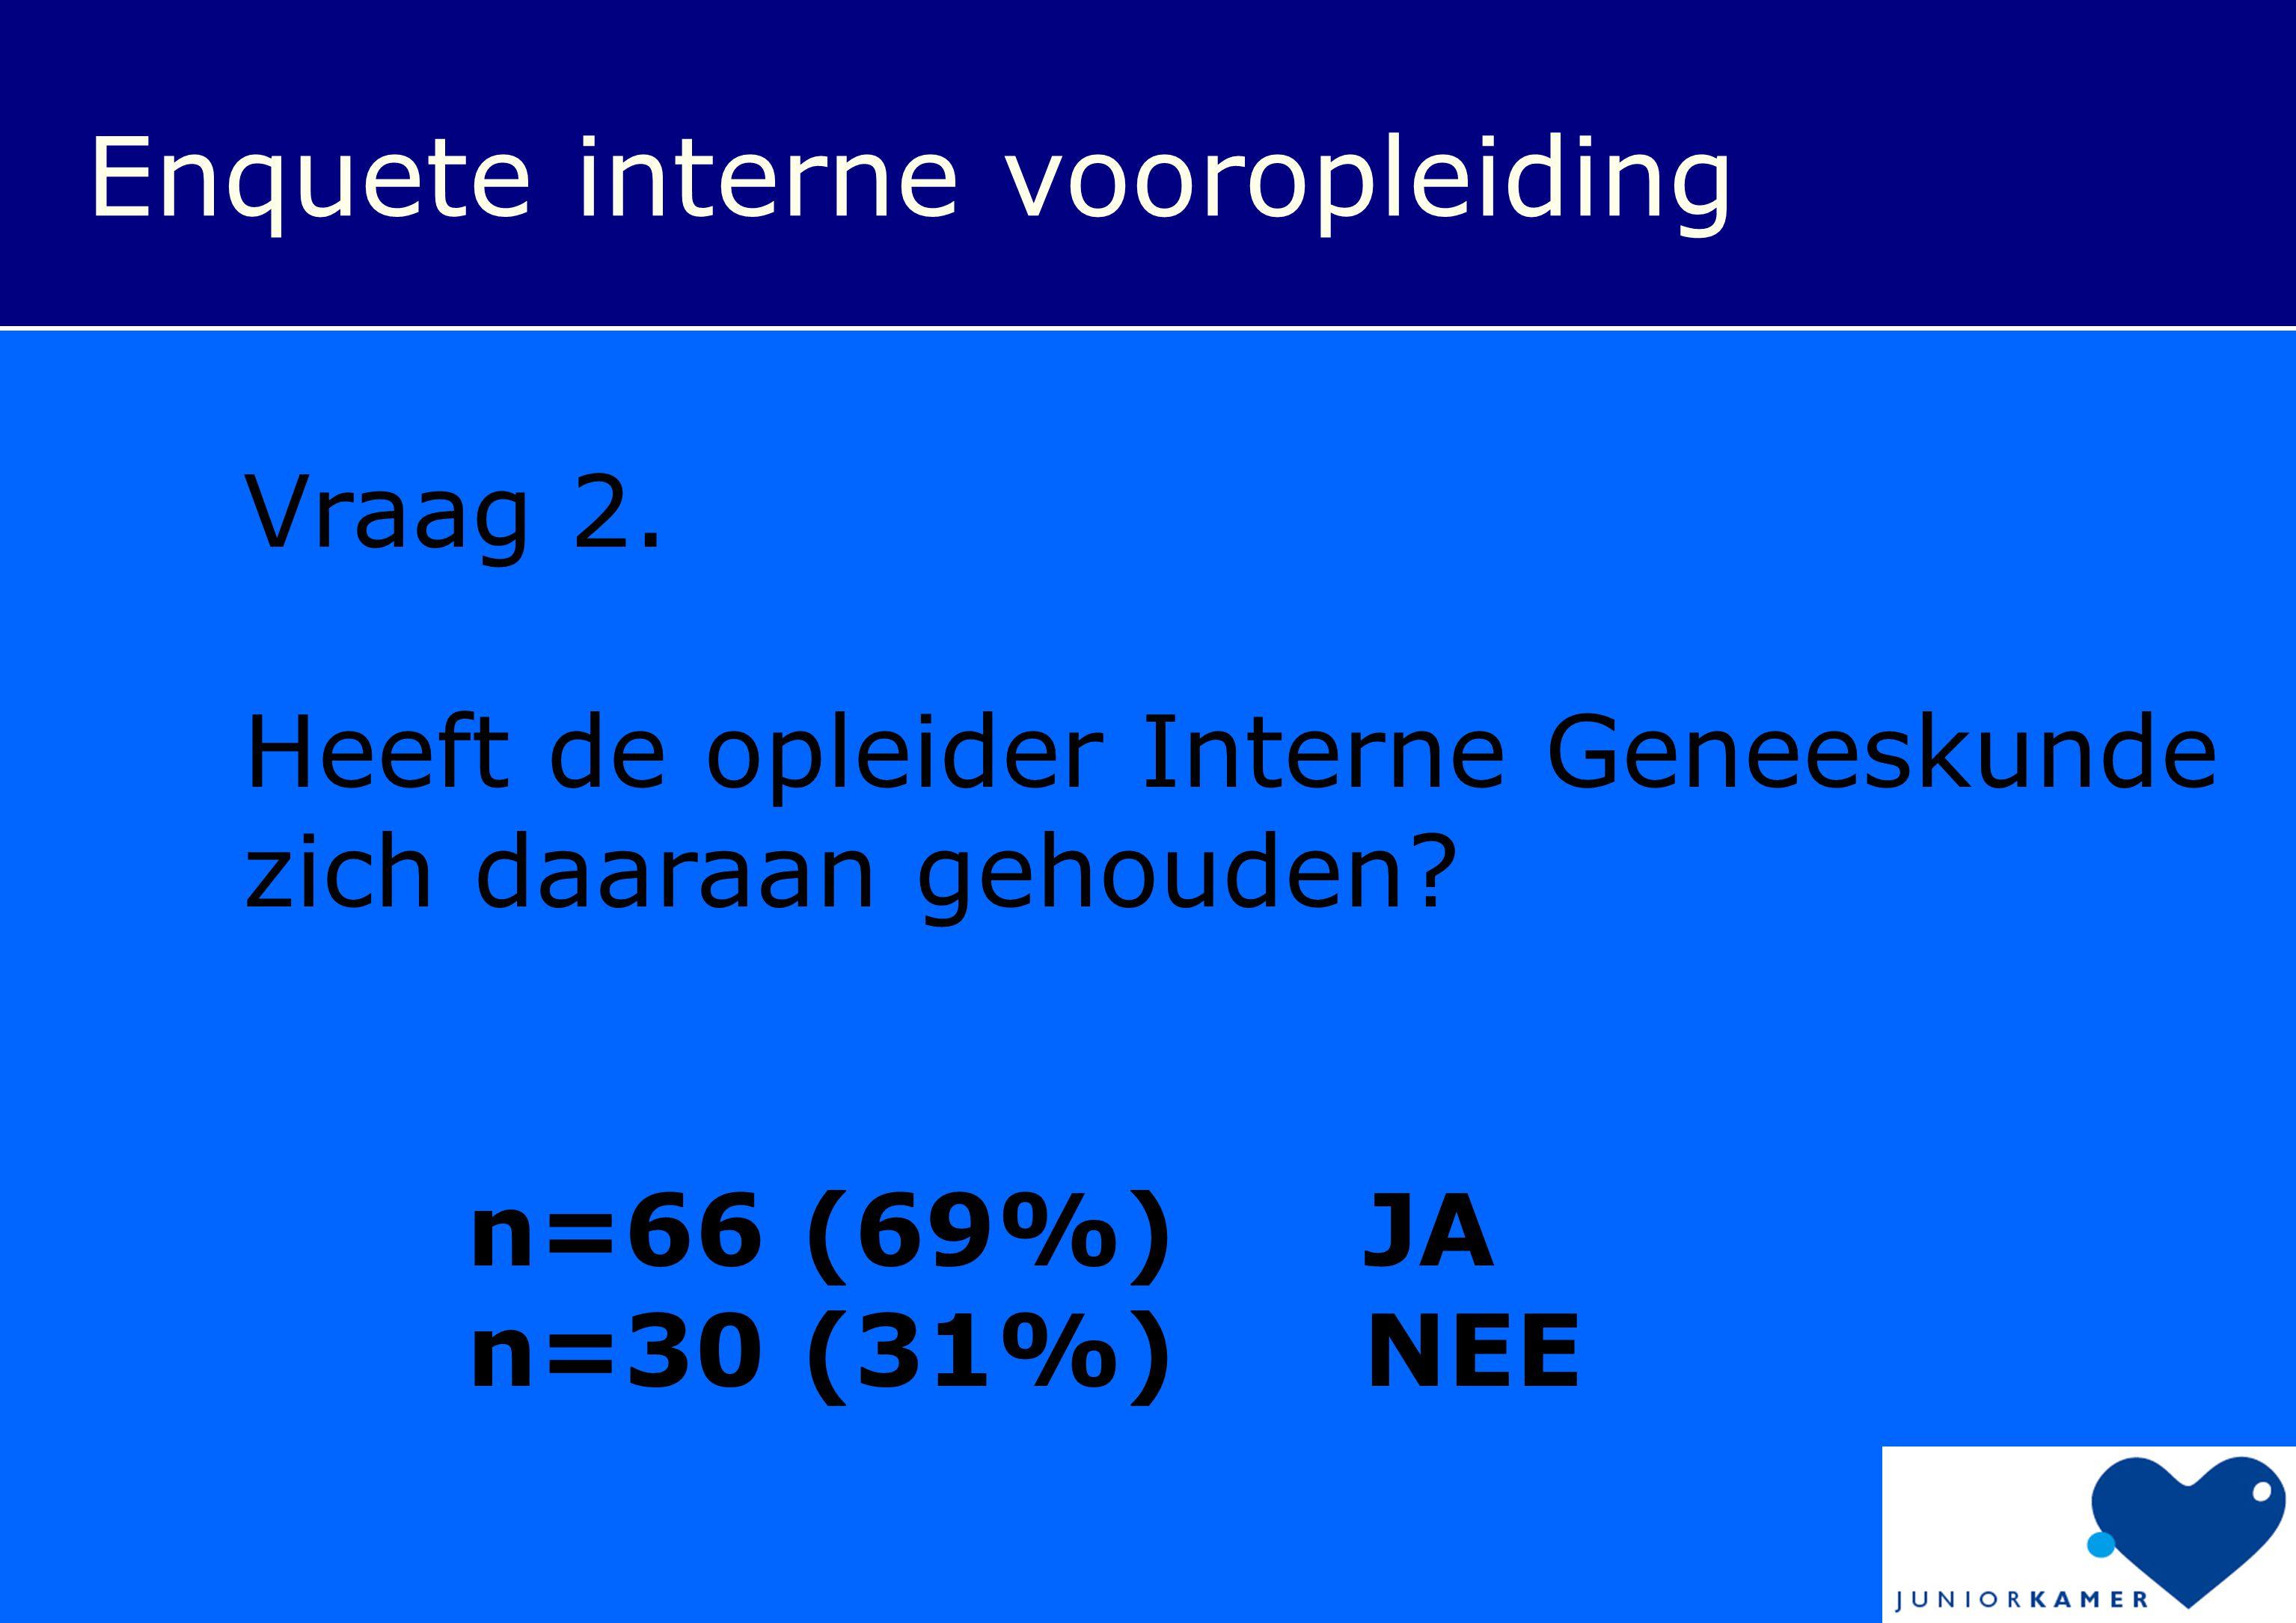 Enquete interne vooropleiding Vraag 2. Heeft de opleider Interne Geneeskunde zich daaraan gehouden? n=66 (69%) JA n=30 (31%) NEE